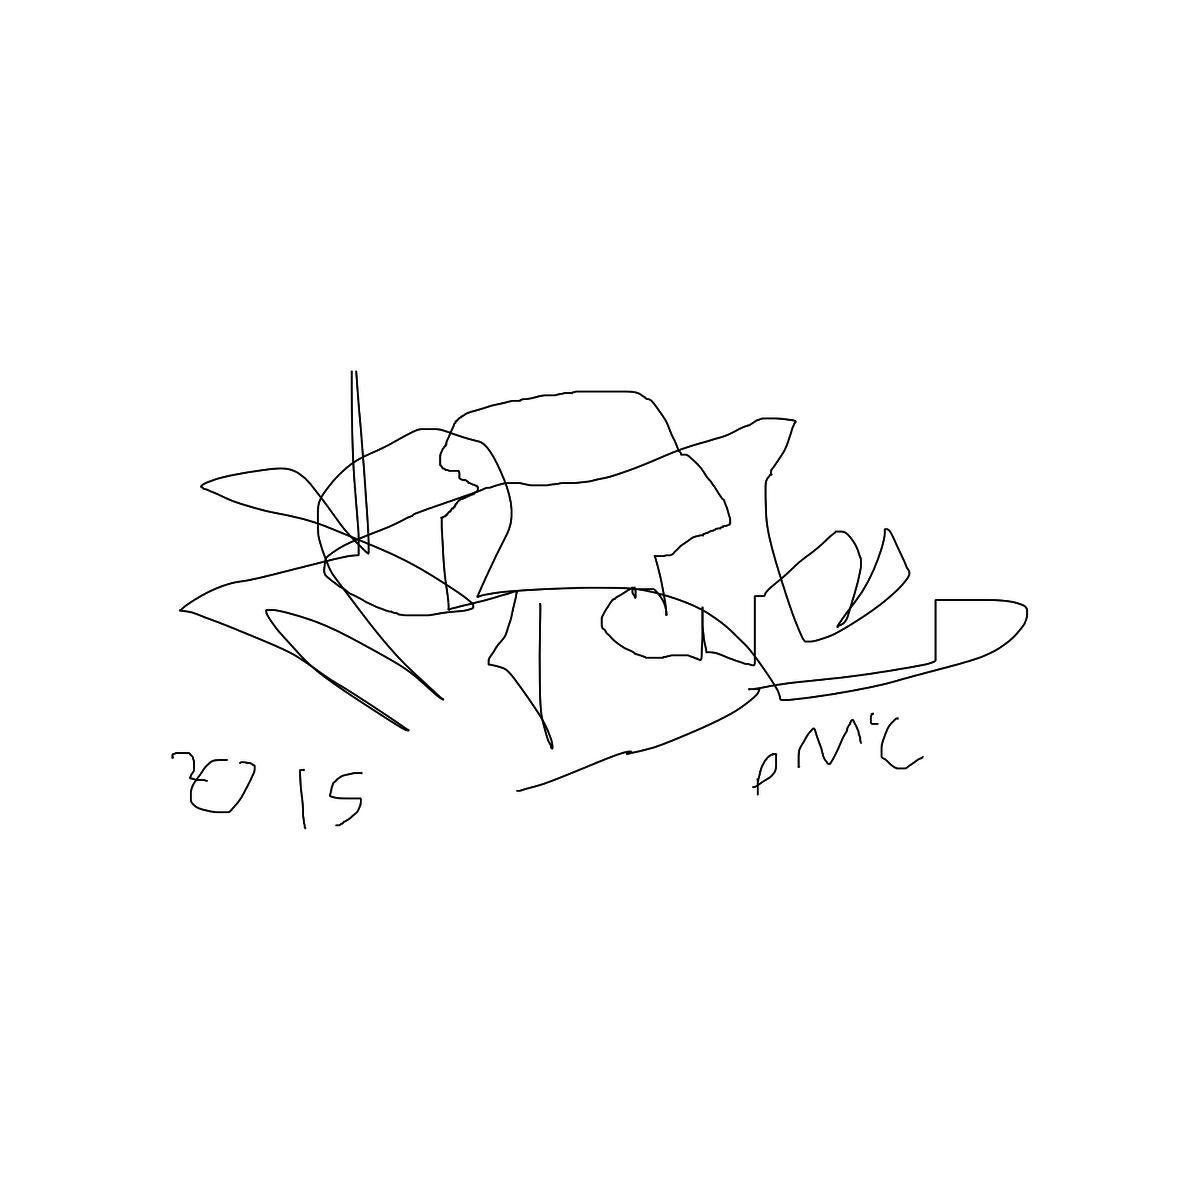 BAAAM drawing#6909 lat:54.2573051452636700lng: -6.8606348037719730